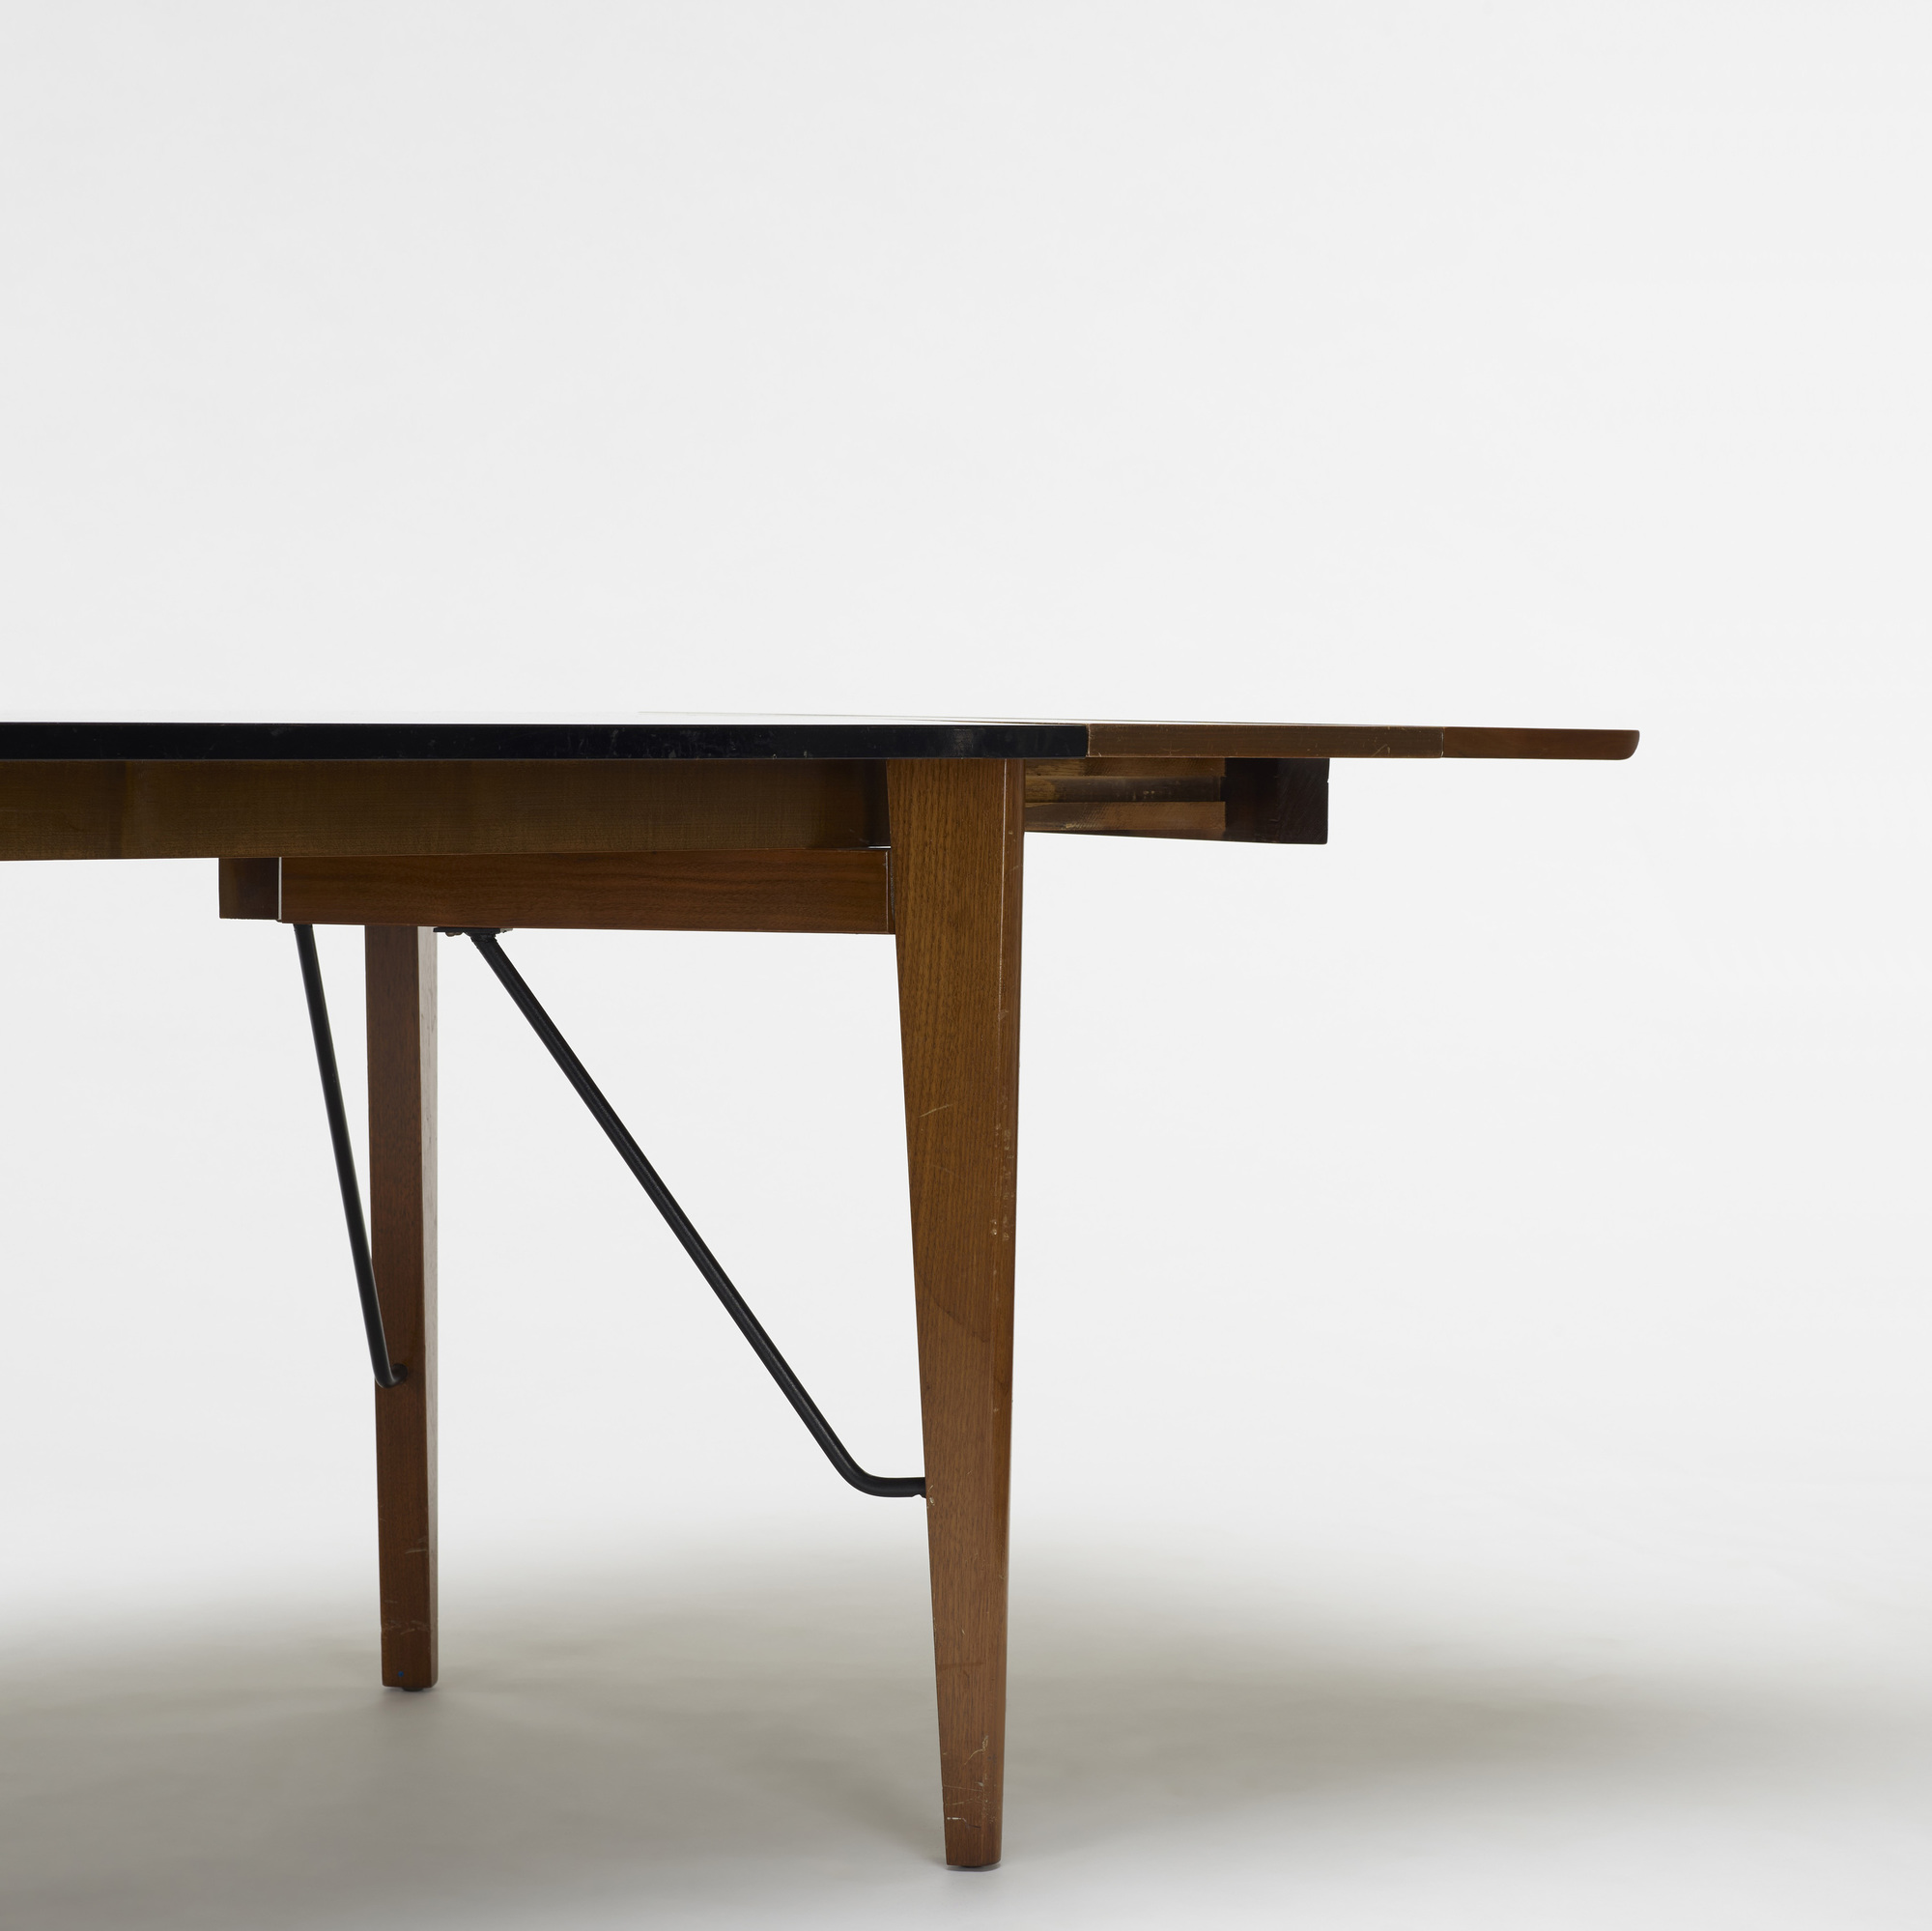 153 greta magnusson grossman dining table design 26 october 153 greta magnusson grossman dining table 3 of 3 geotapseo Gallery